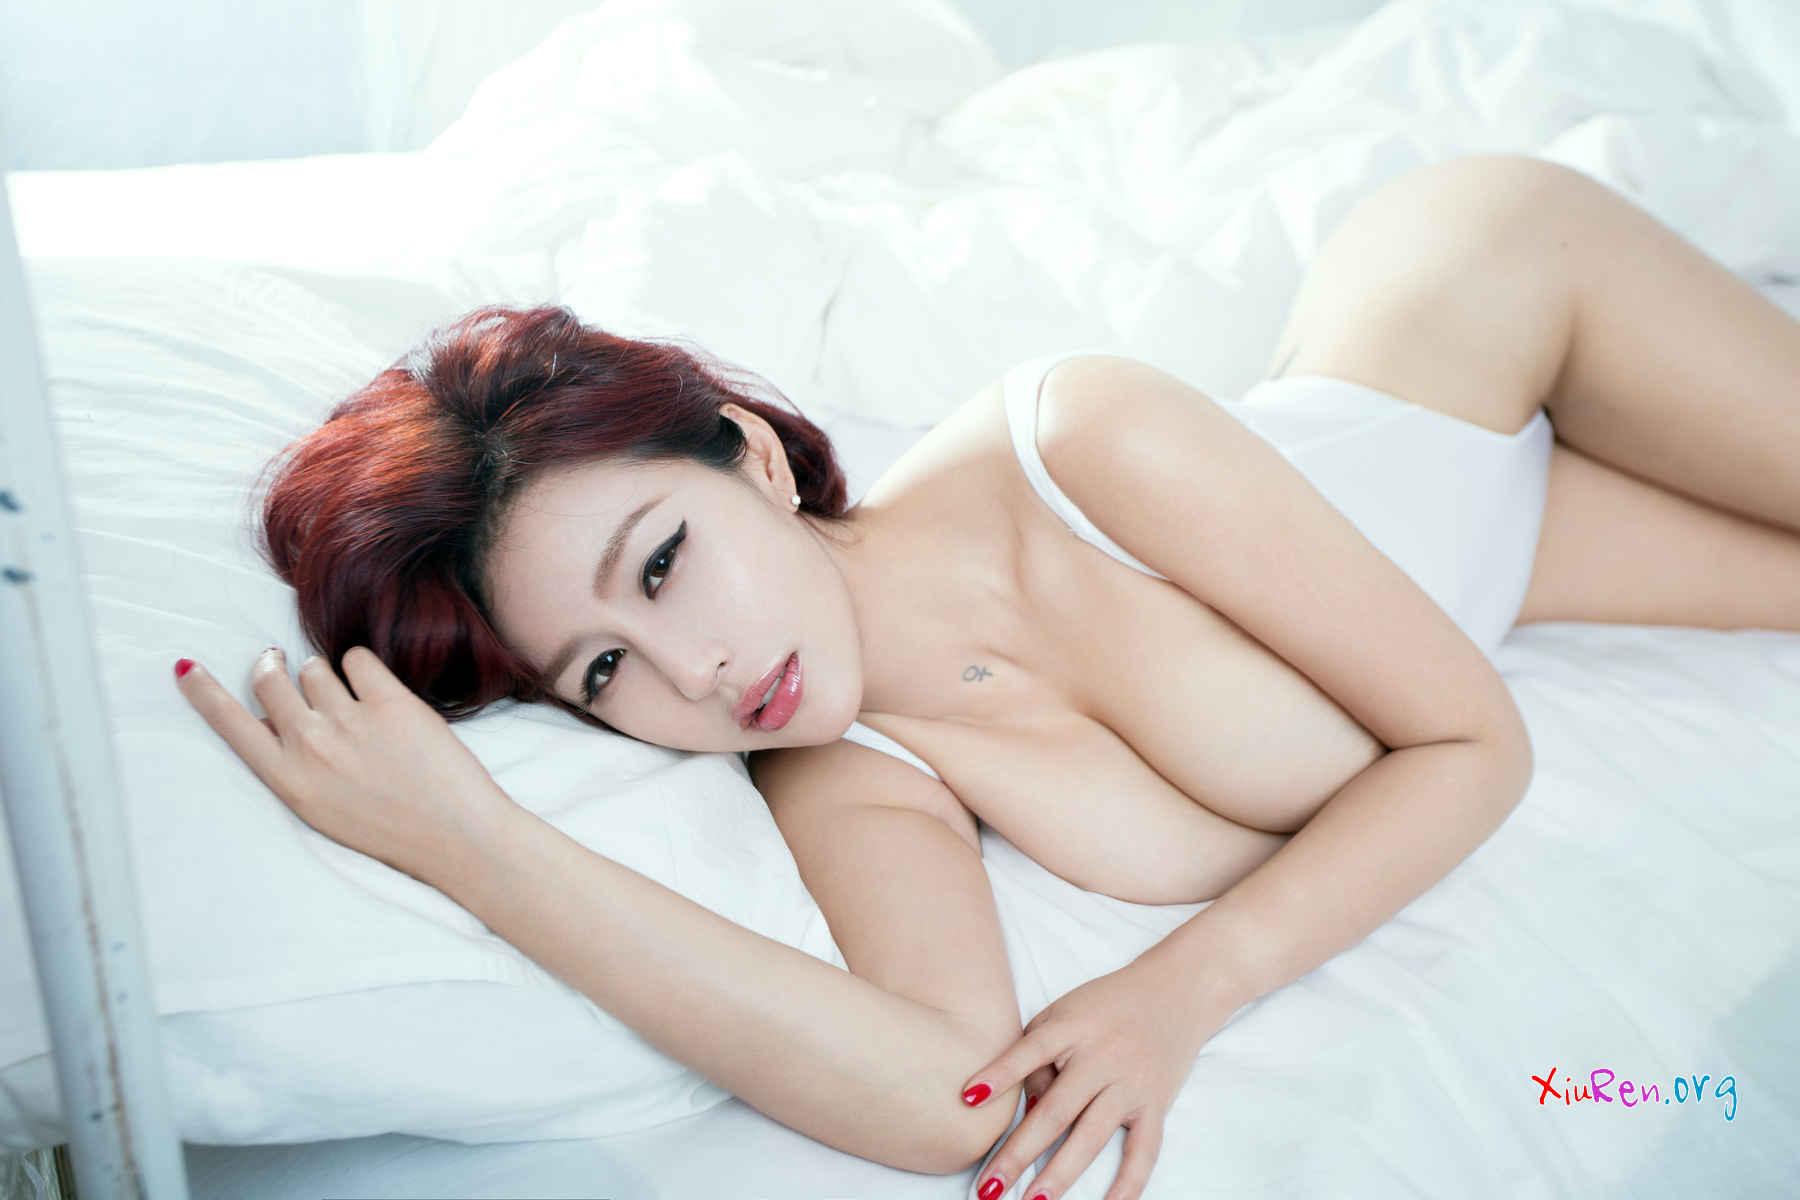 nude women gagging pics